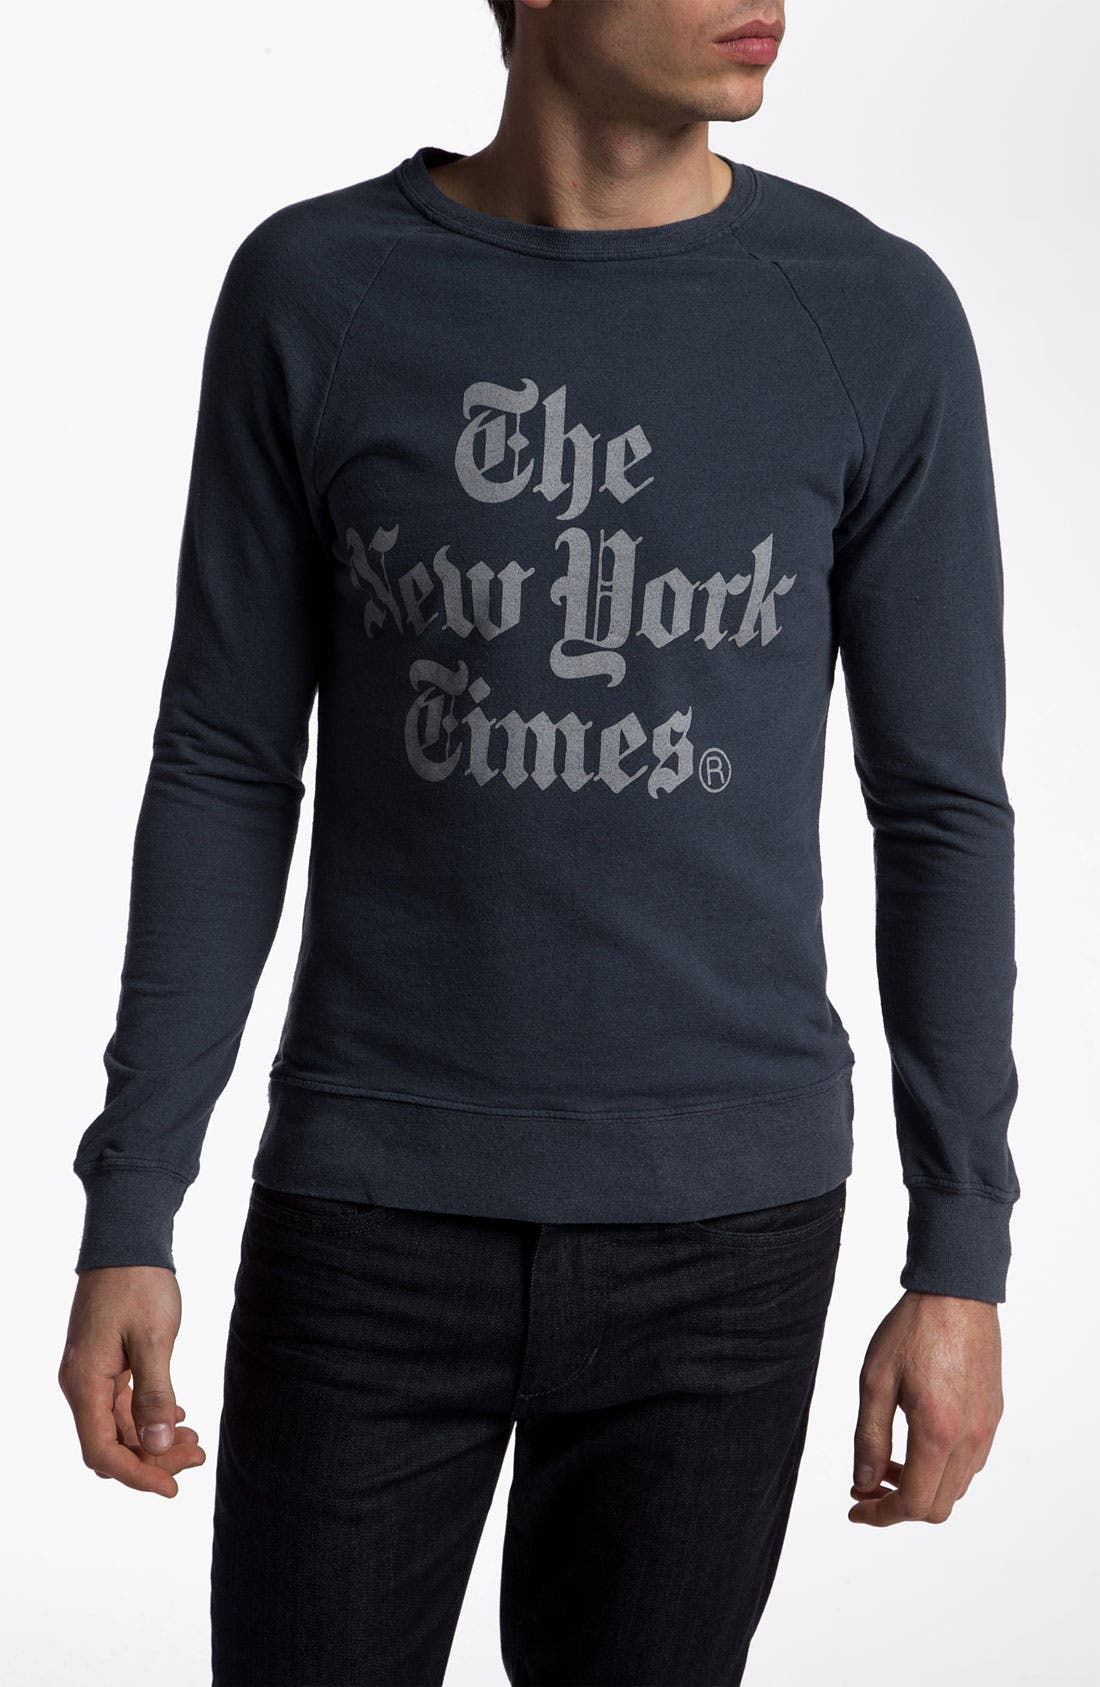 Main Image - Altru 'The New York Times®' Graphic Crewneck Sweatshirt